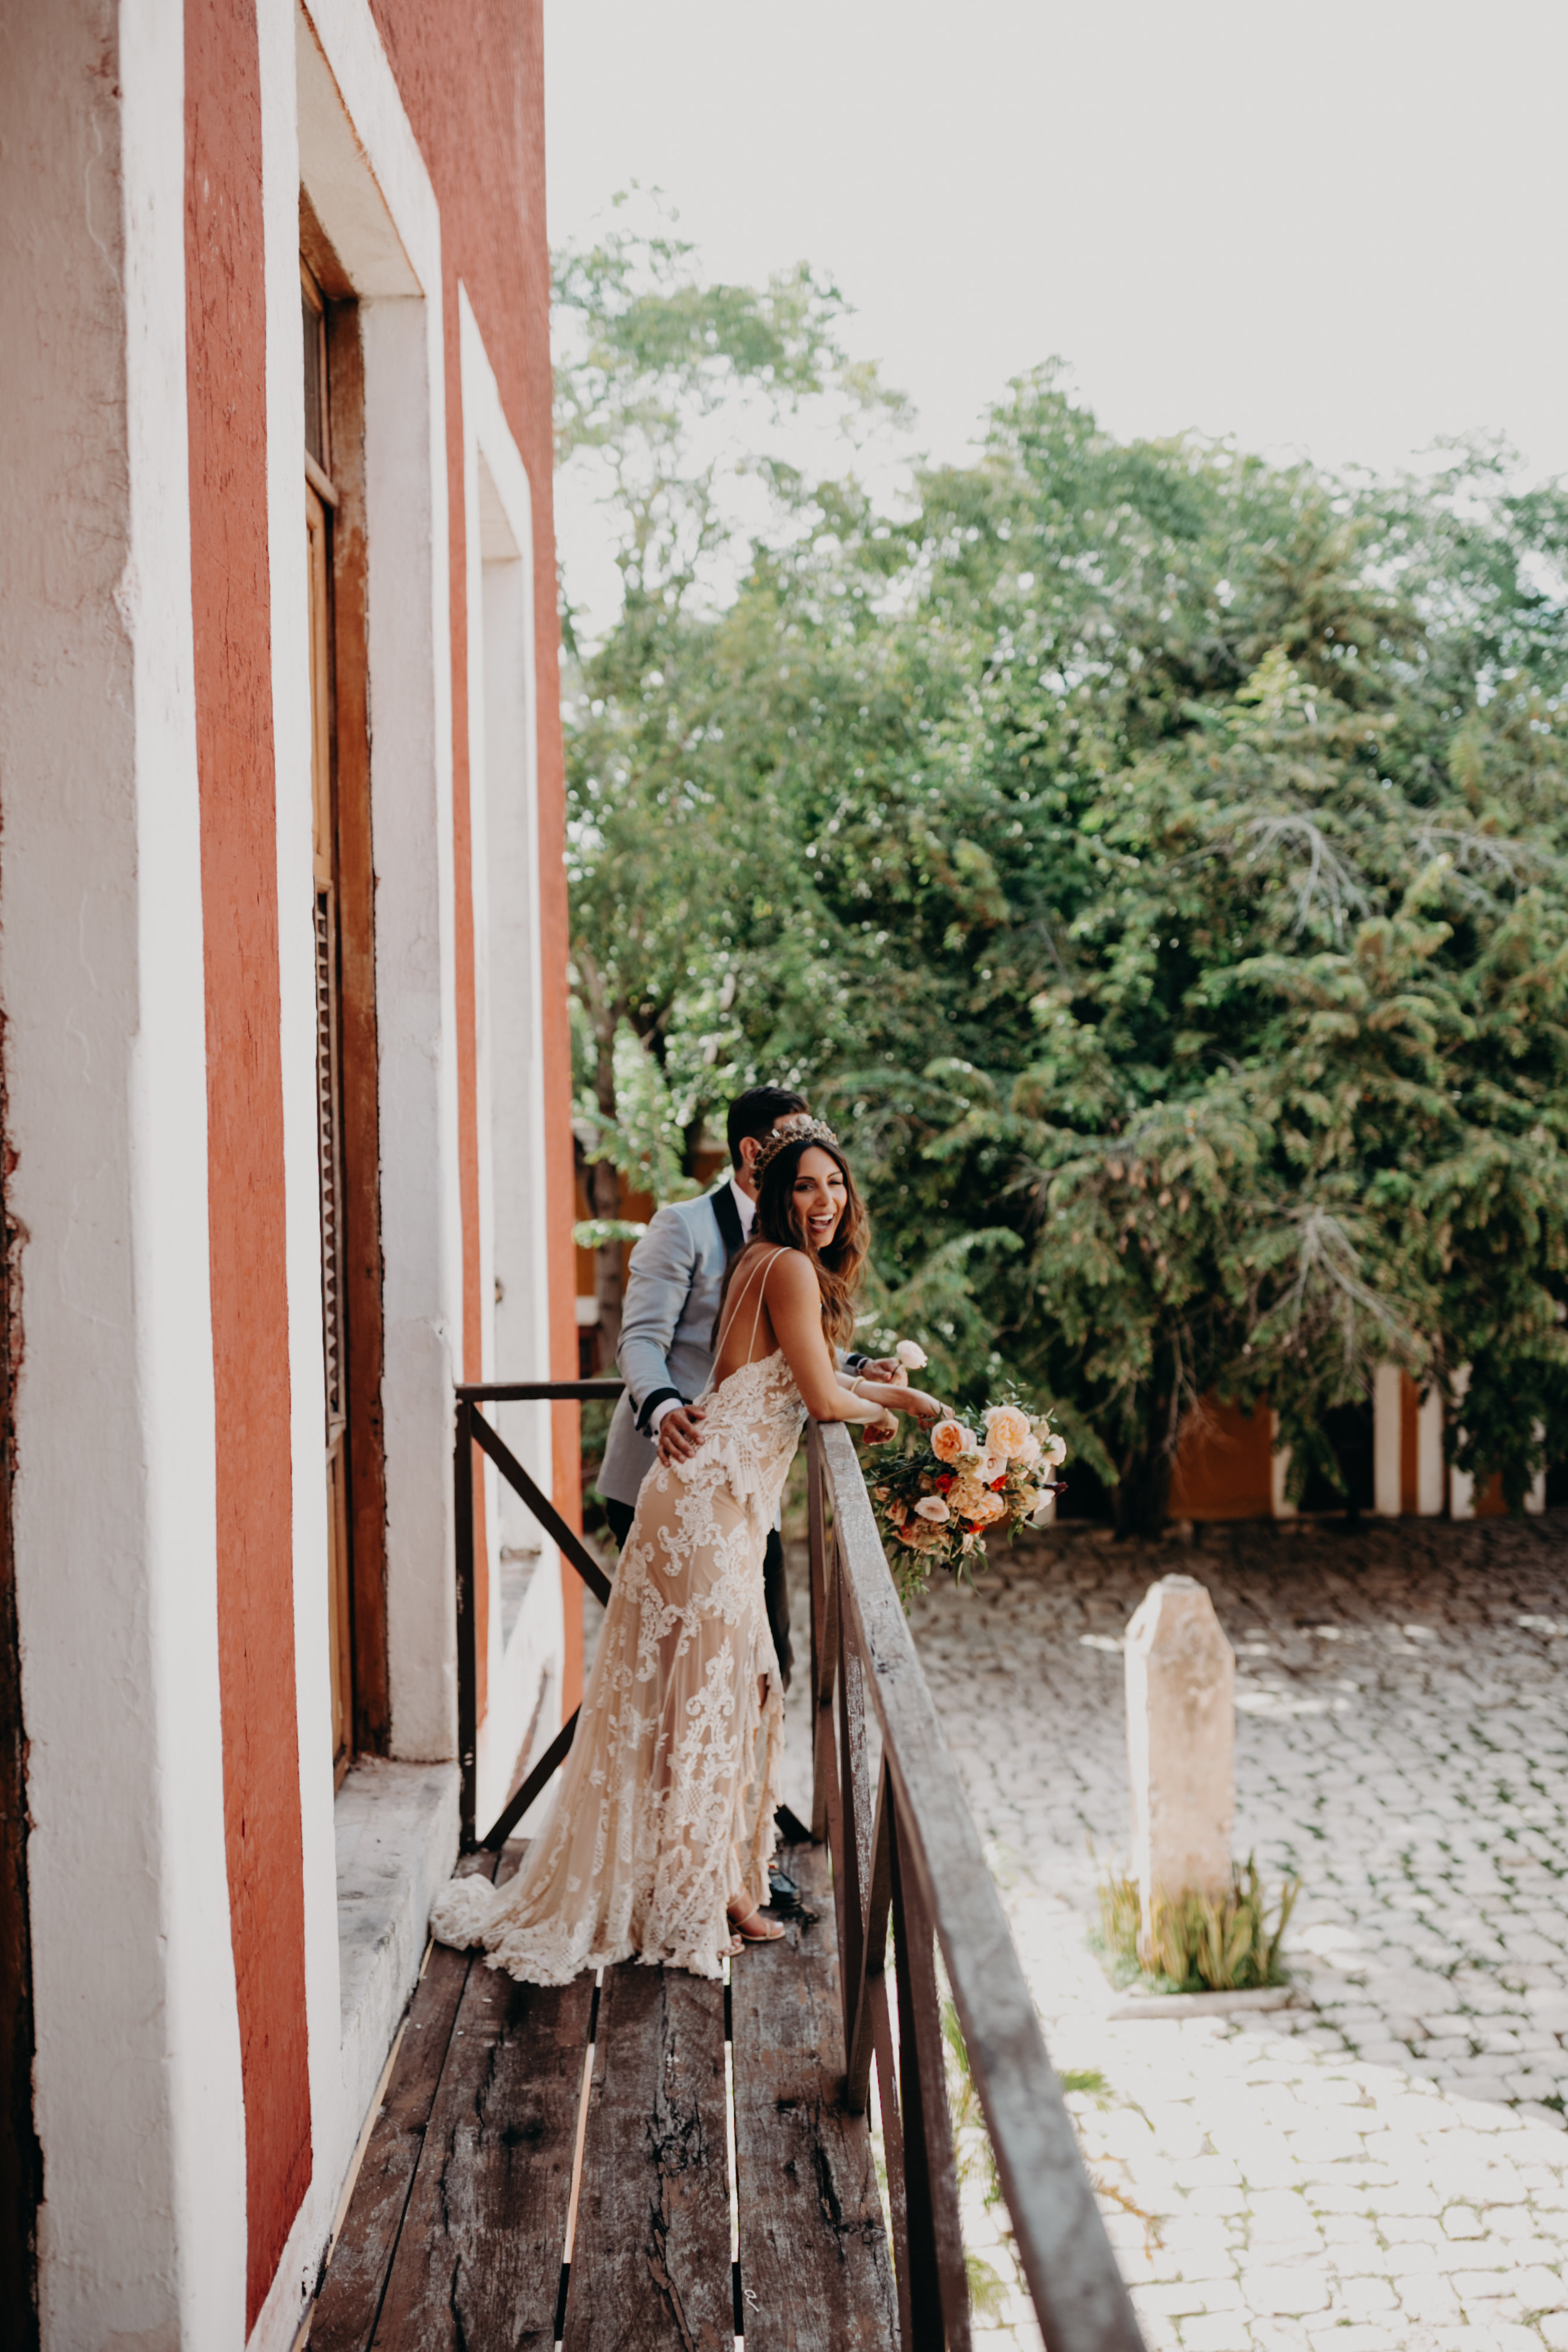 Hacienda Temozon Yucatan Mexico Wedding | Ida & Peter Emily Magers Photography-638.jpg